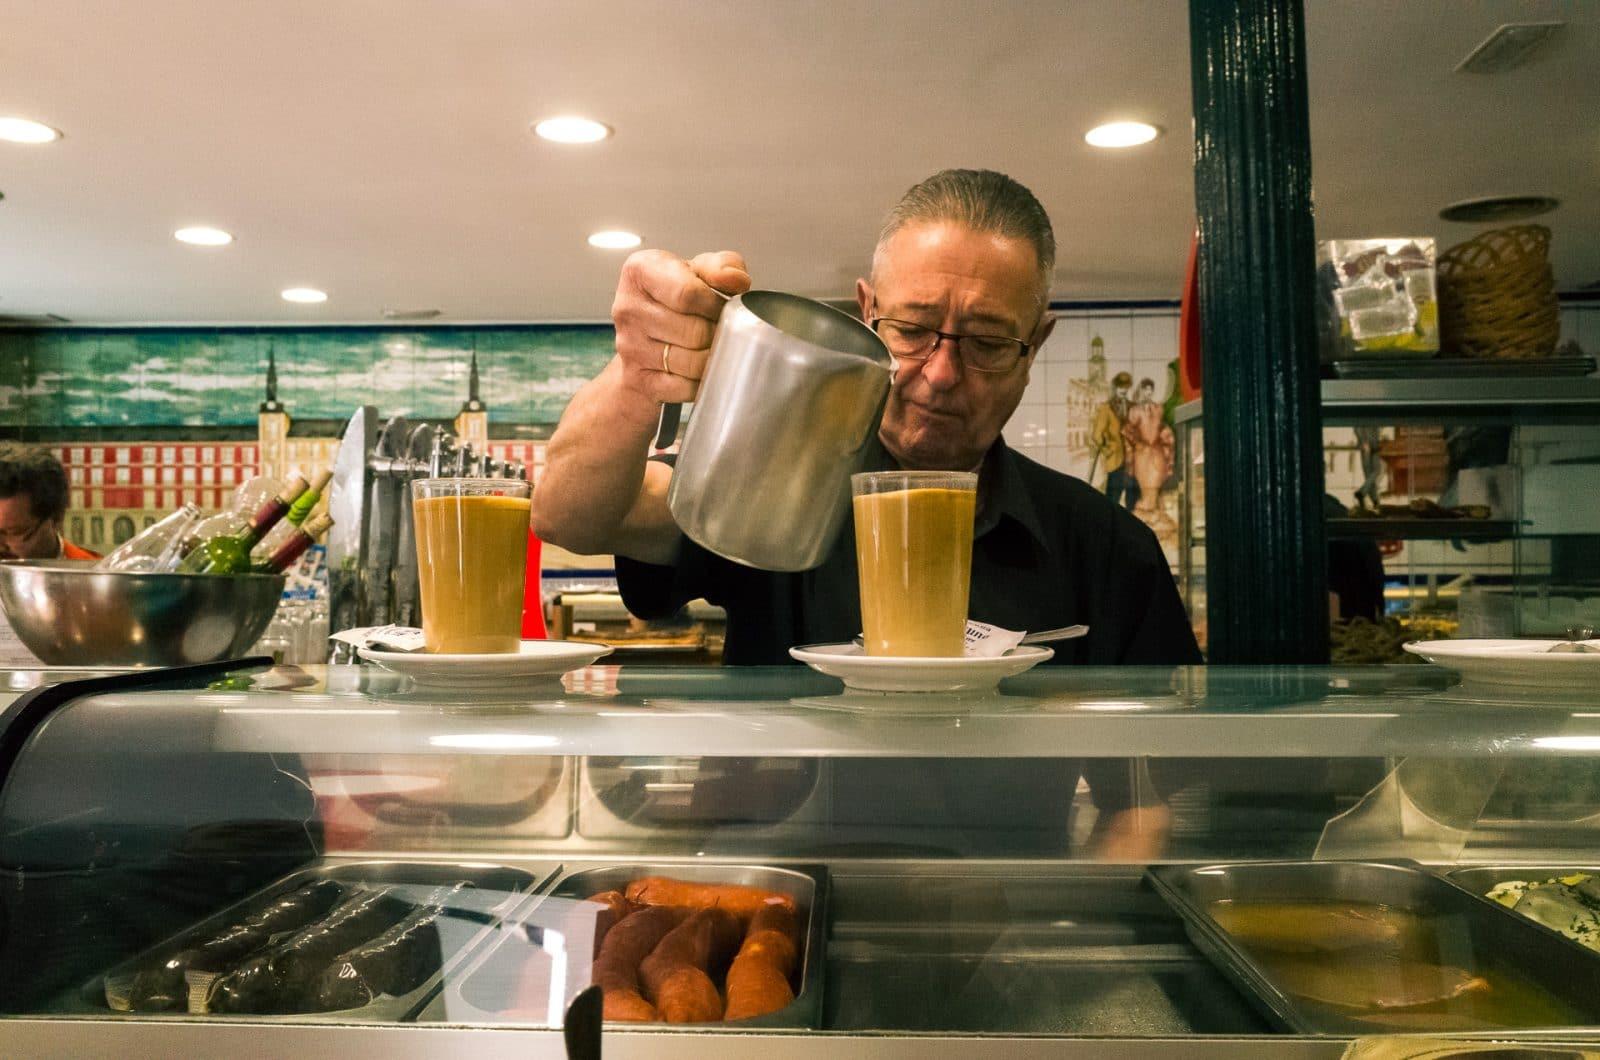 Los Madrileños A guy serving coffe in a cafe